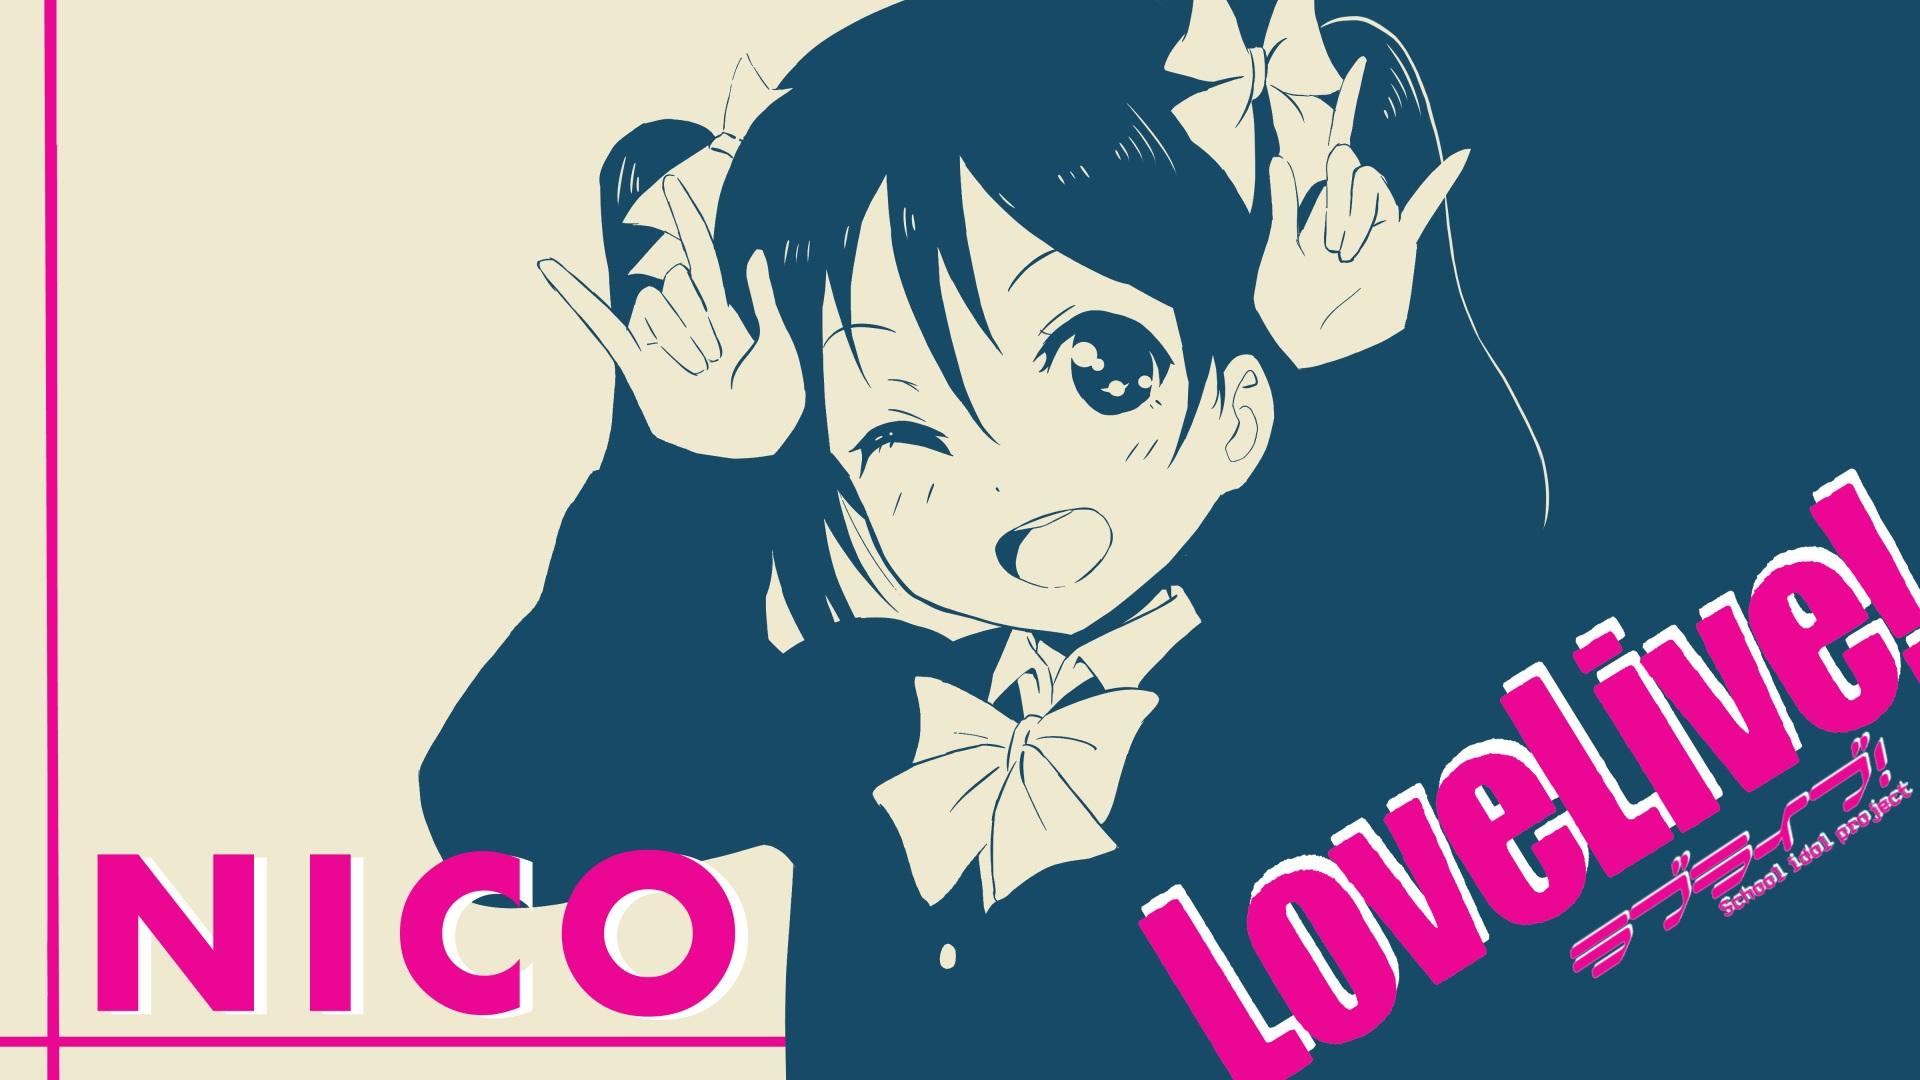 Anime 1920x1080 Yazawa Nico Love Live! anime anime girls typography open mouth